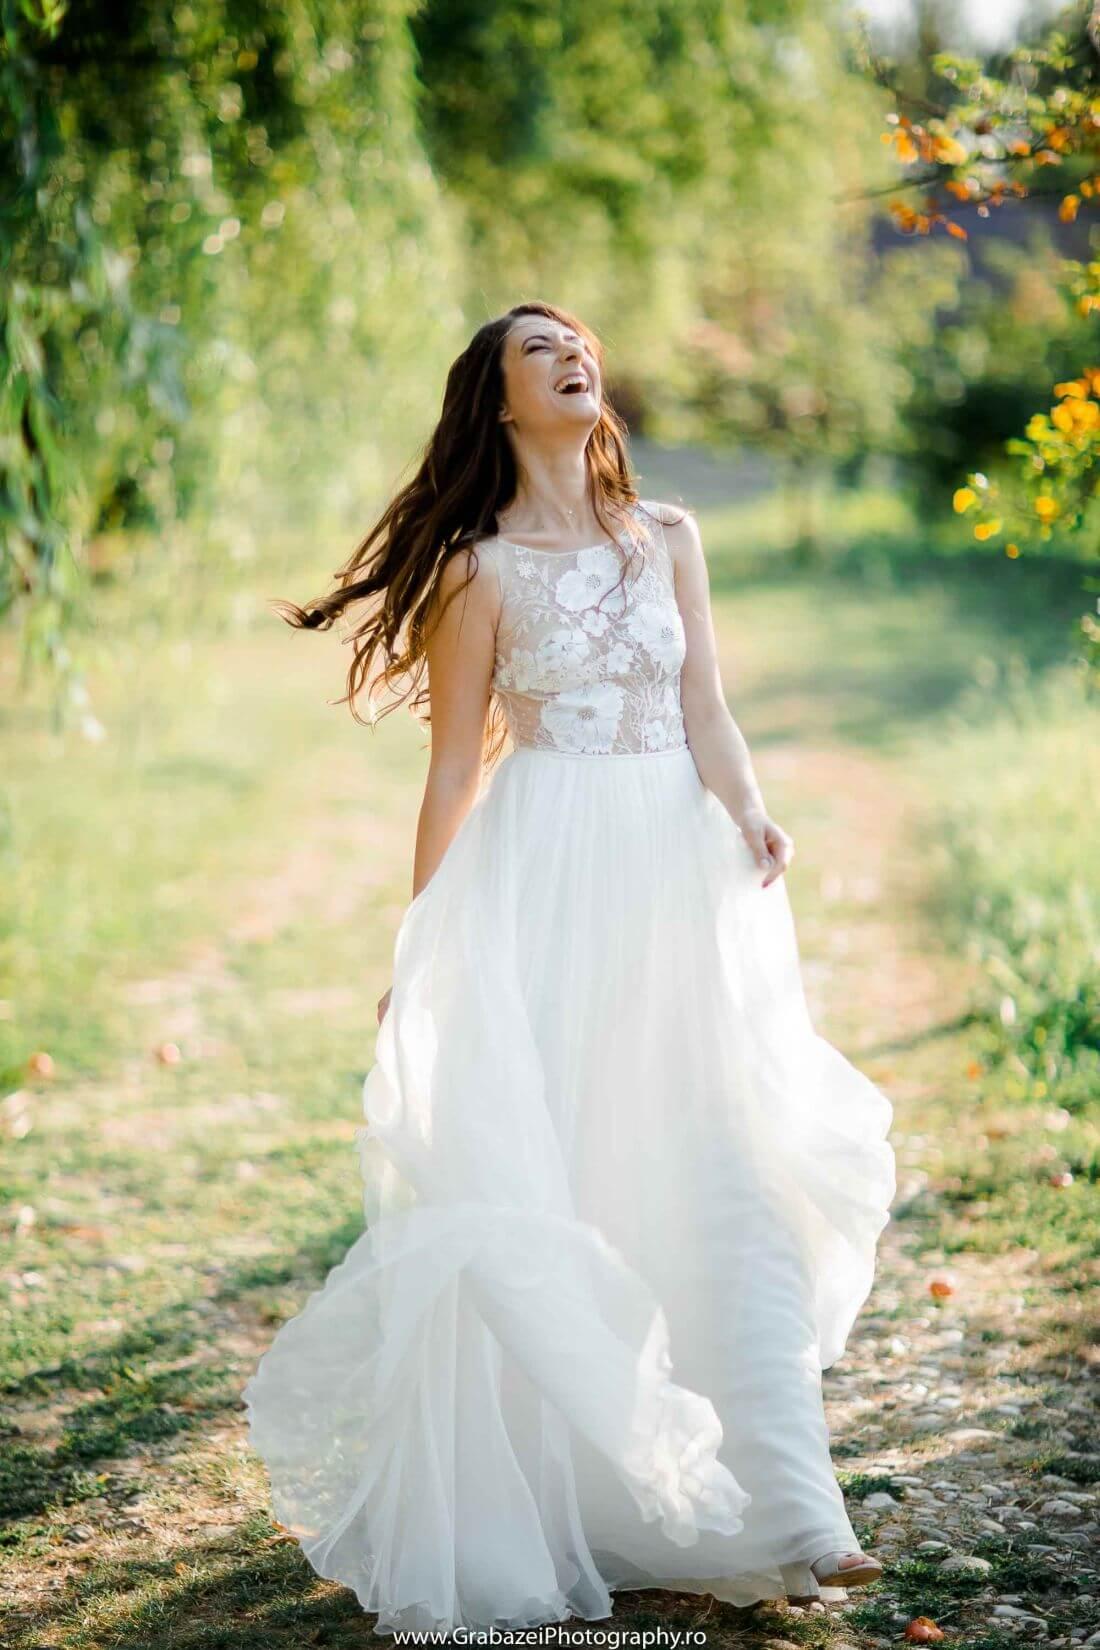 Nunta cu bumbac – Cristina si Sergiu – IDO-Weddings-nuntiinaerliber (13)